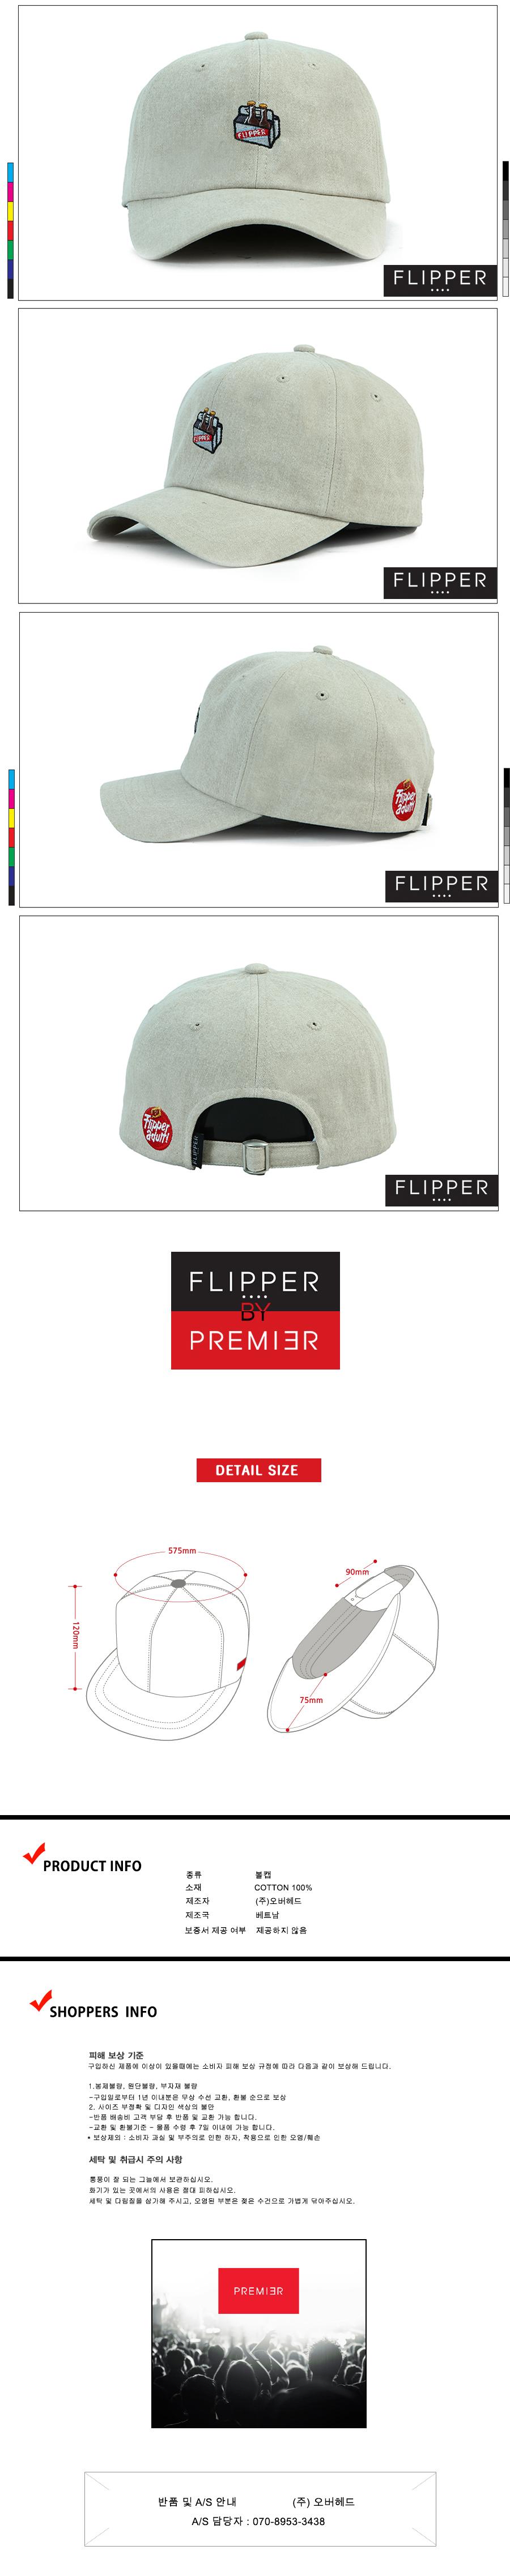 [ PREMIER ] [Premier] Flipper Ball Cap Beer Pack Beige (FL159)